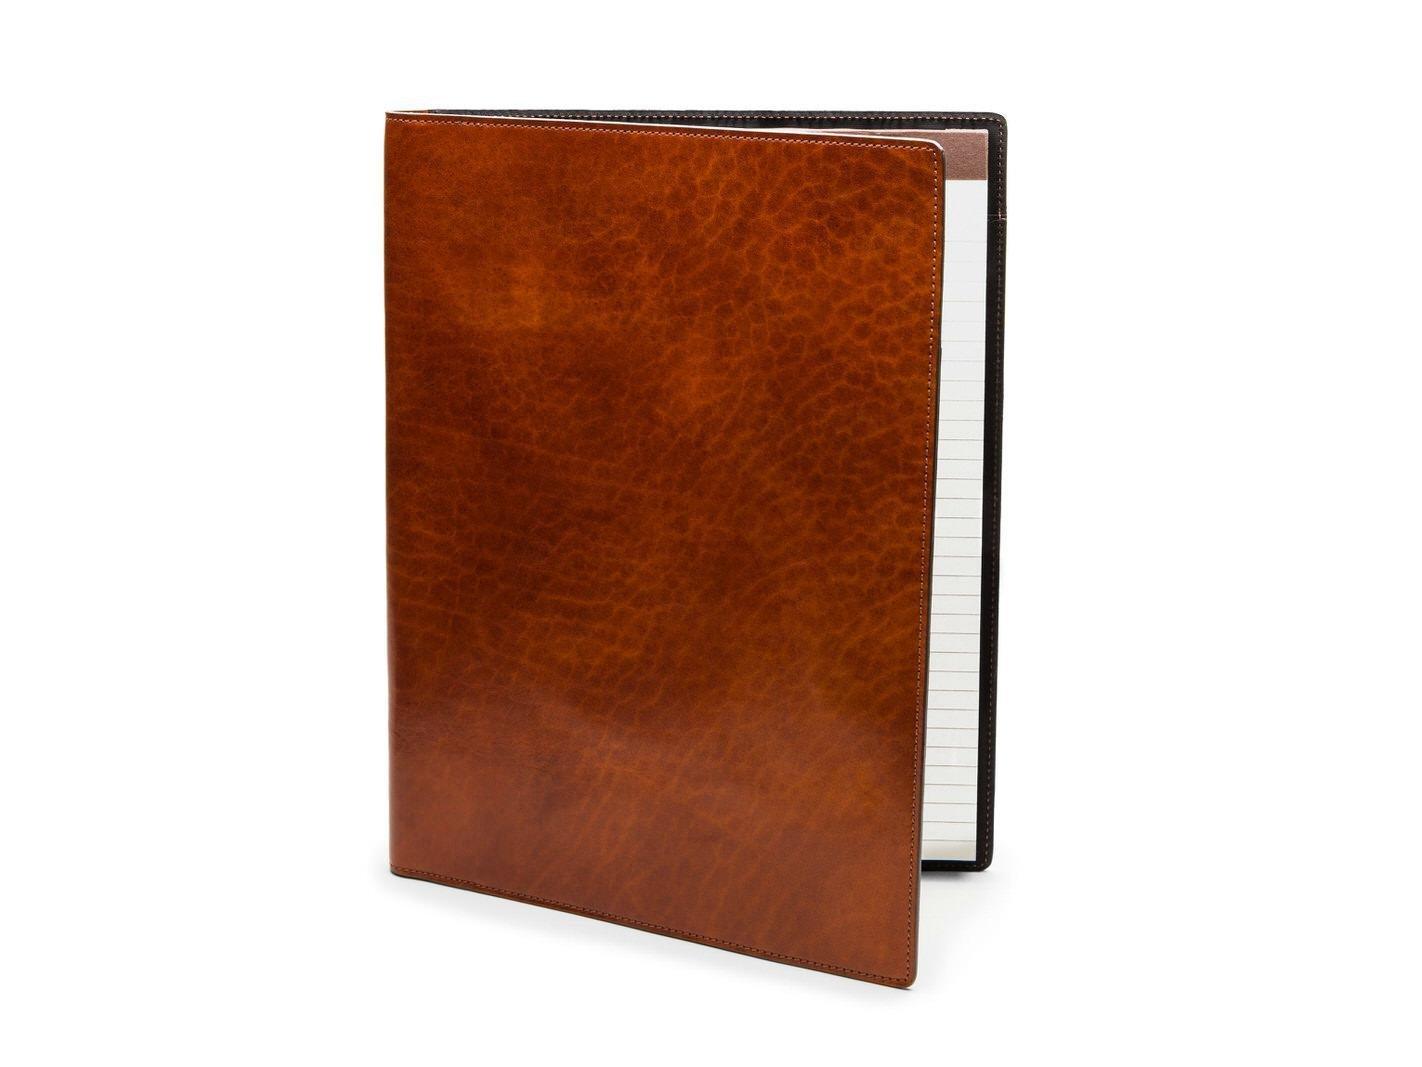 Bosca Dolce Flexible Leather Portfolio 8.5x11 (Amber)